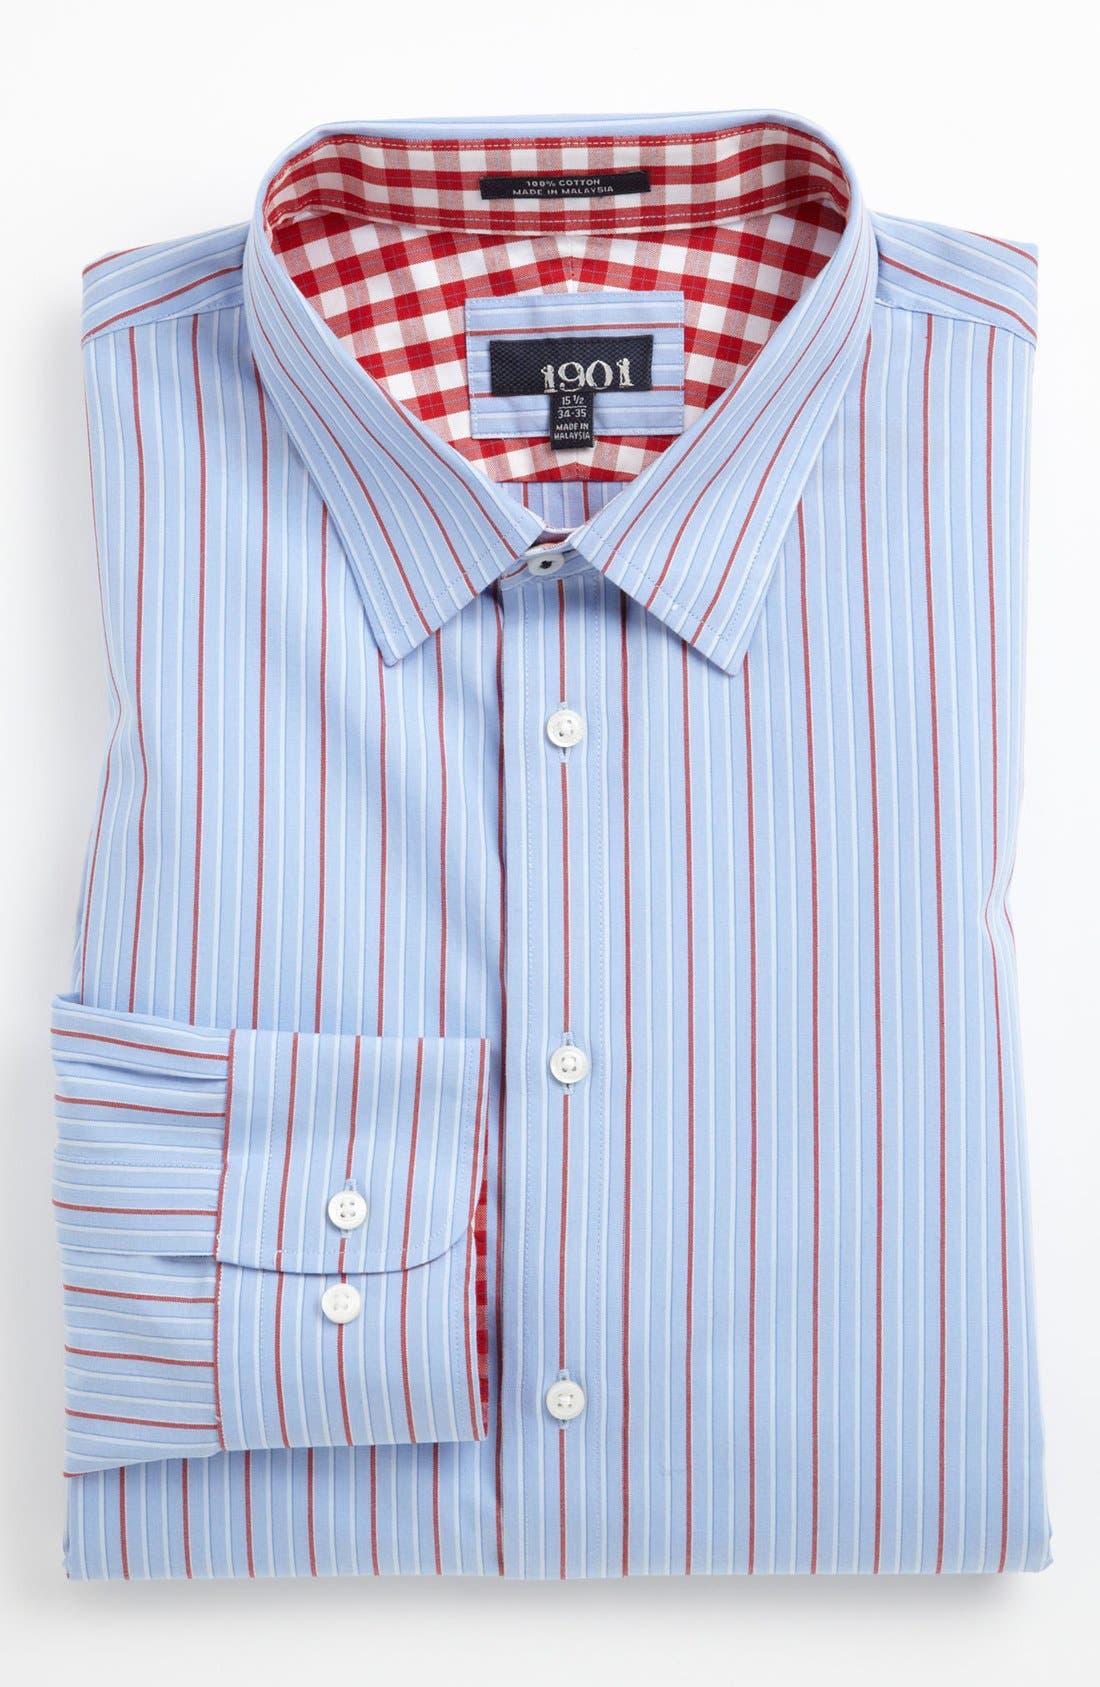 Alternate Image 1 Selected - 1901 Trim Fit Dress Shirt